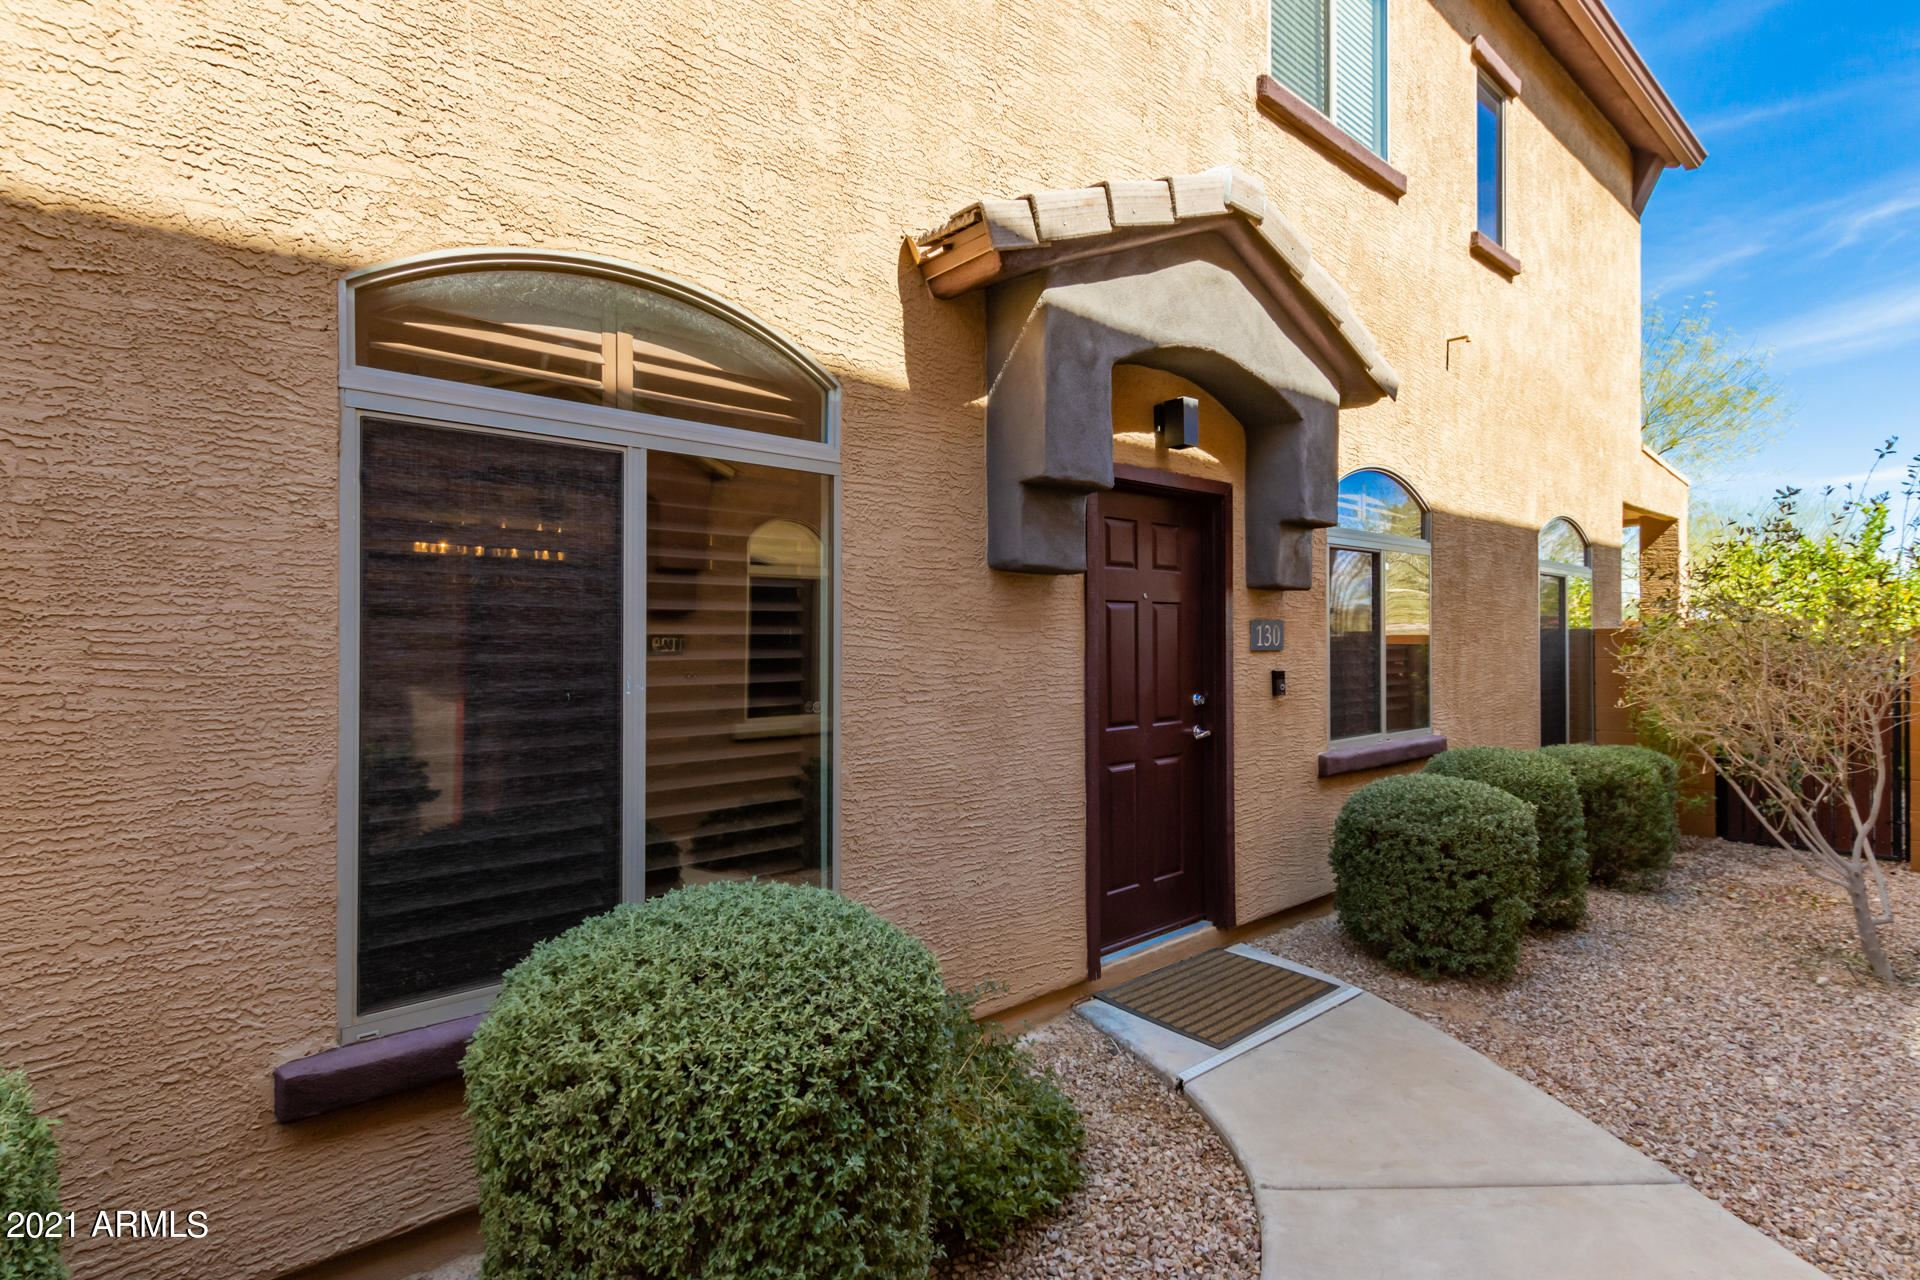 Photo of 17365 N CAVE CREEK Road #130, Phoenix, AZ 85032 (MLS # 6198582)